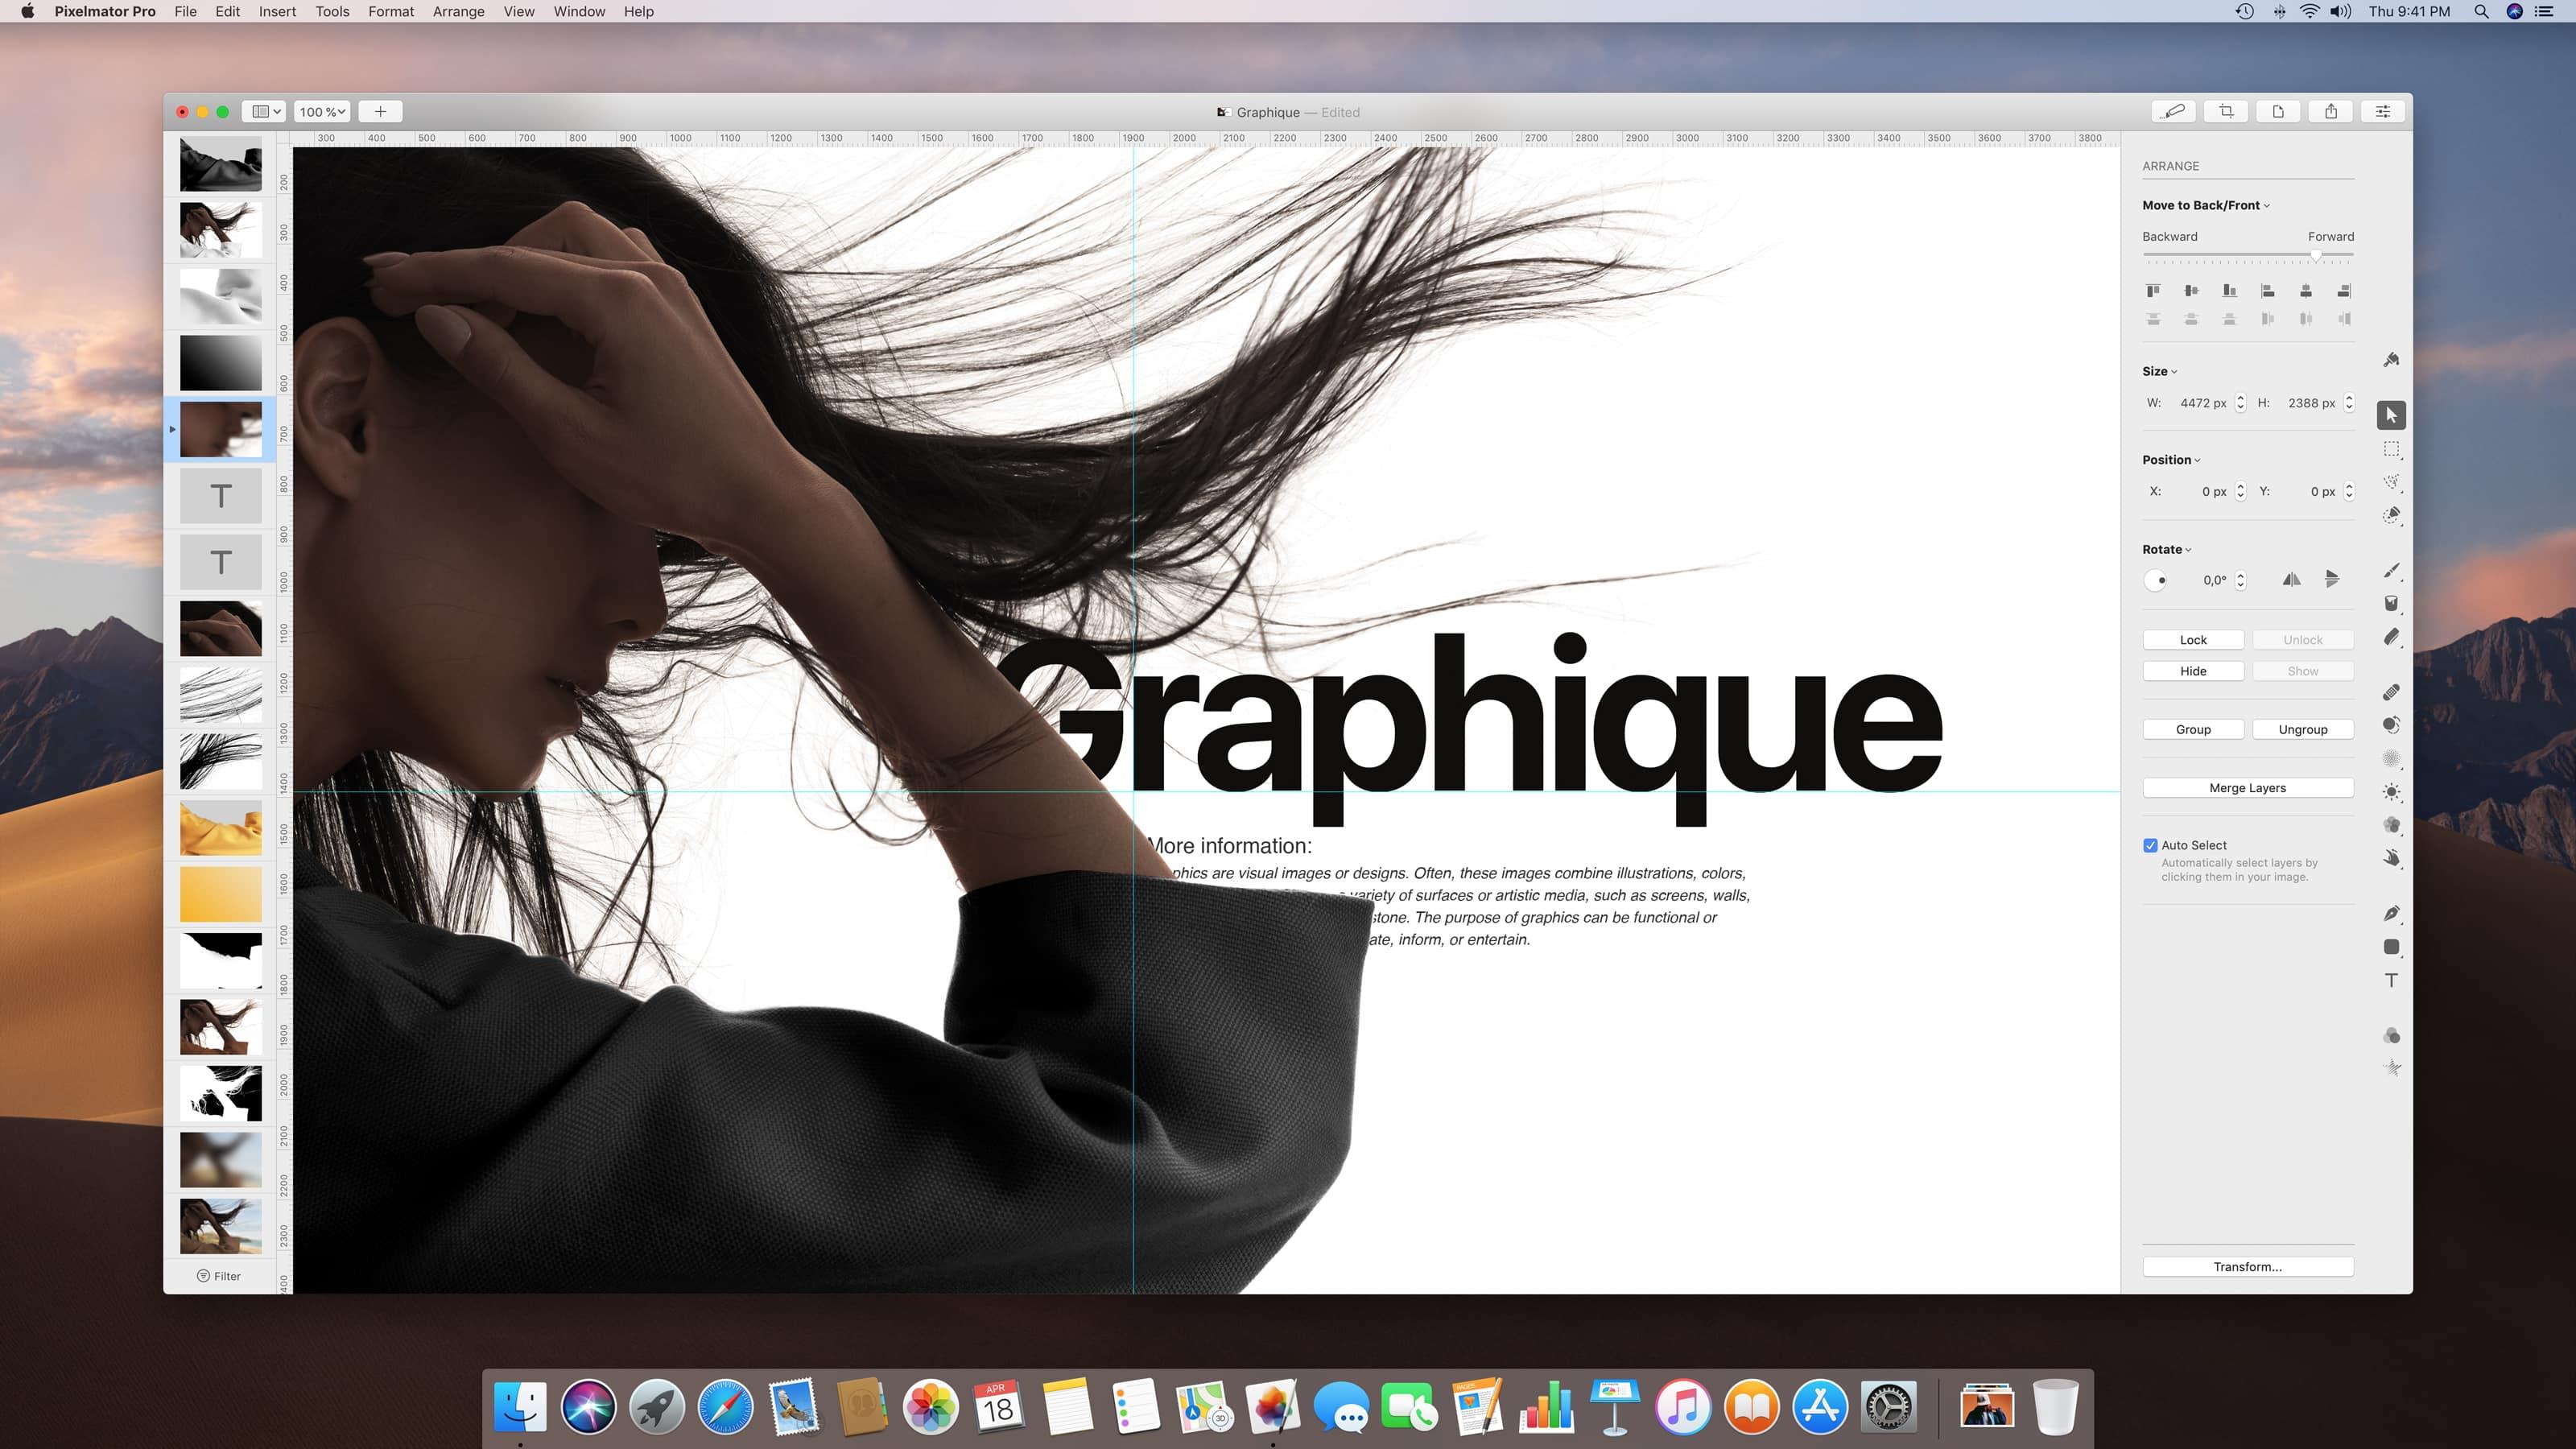 Pixelmator Pro Adobe Photoshop alternative